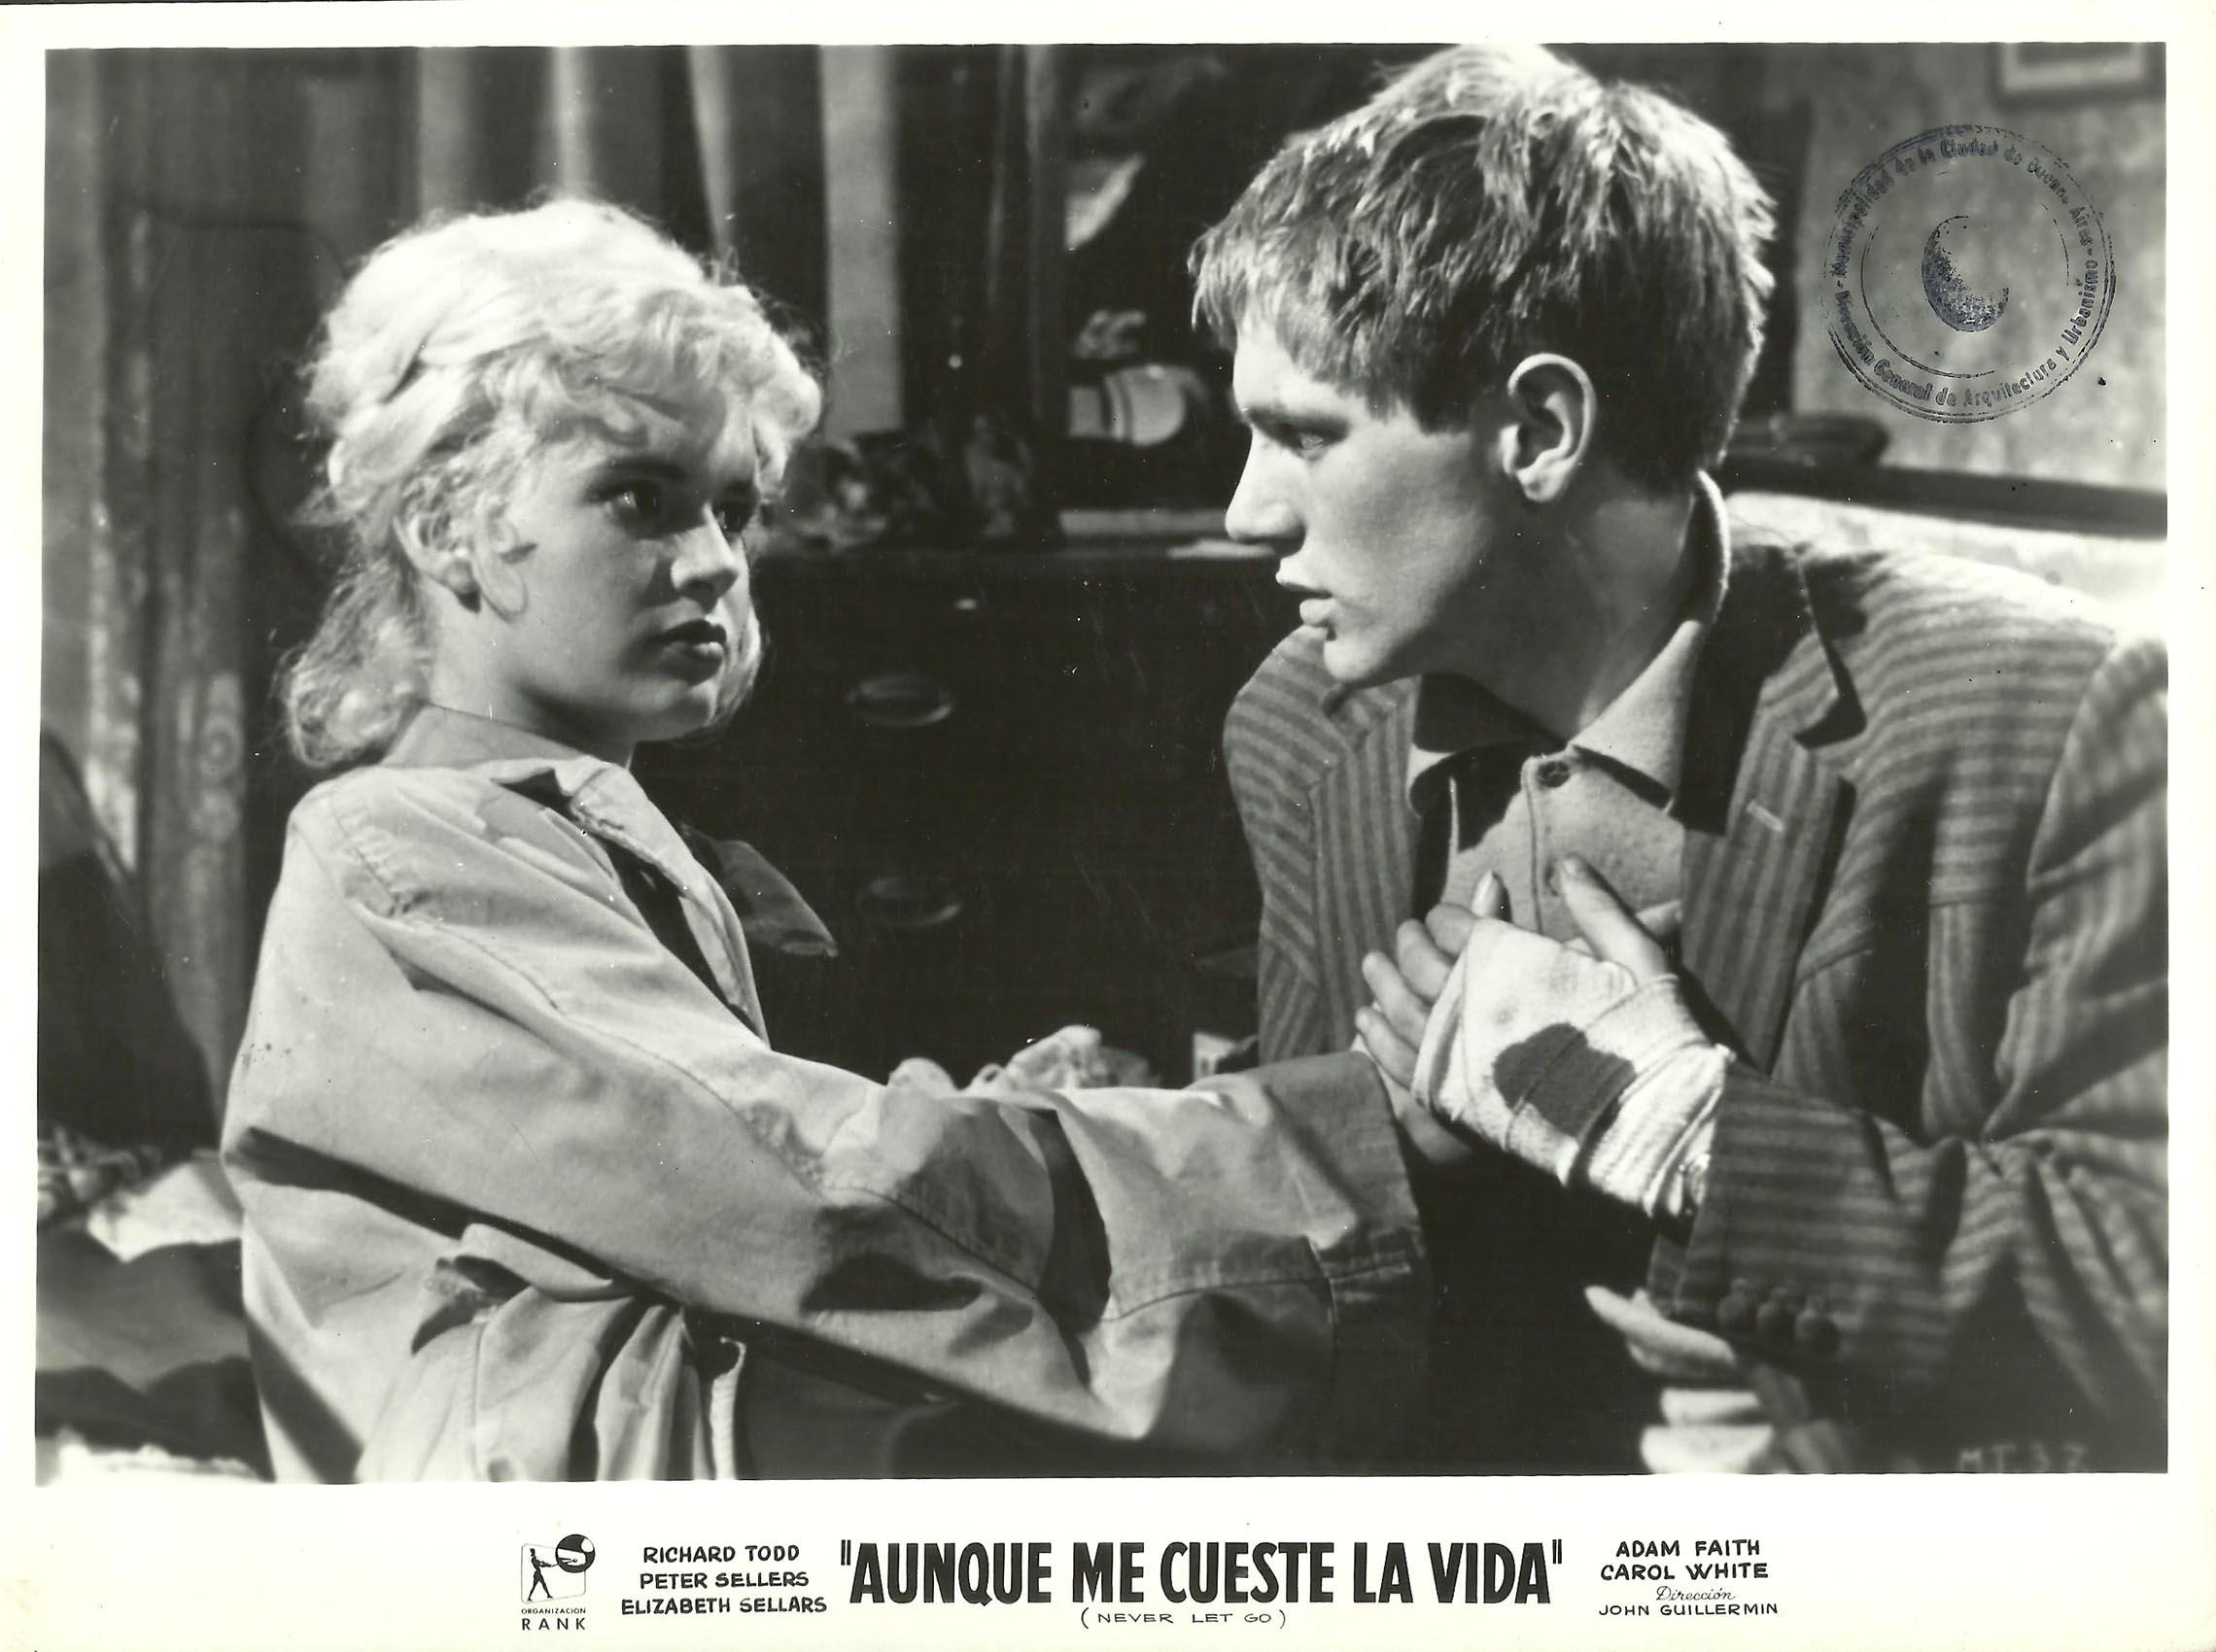 Adam Faith and Carol White in Never Let Go (1960)